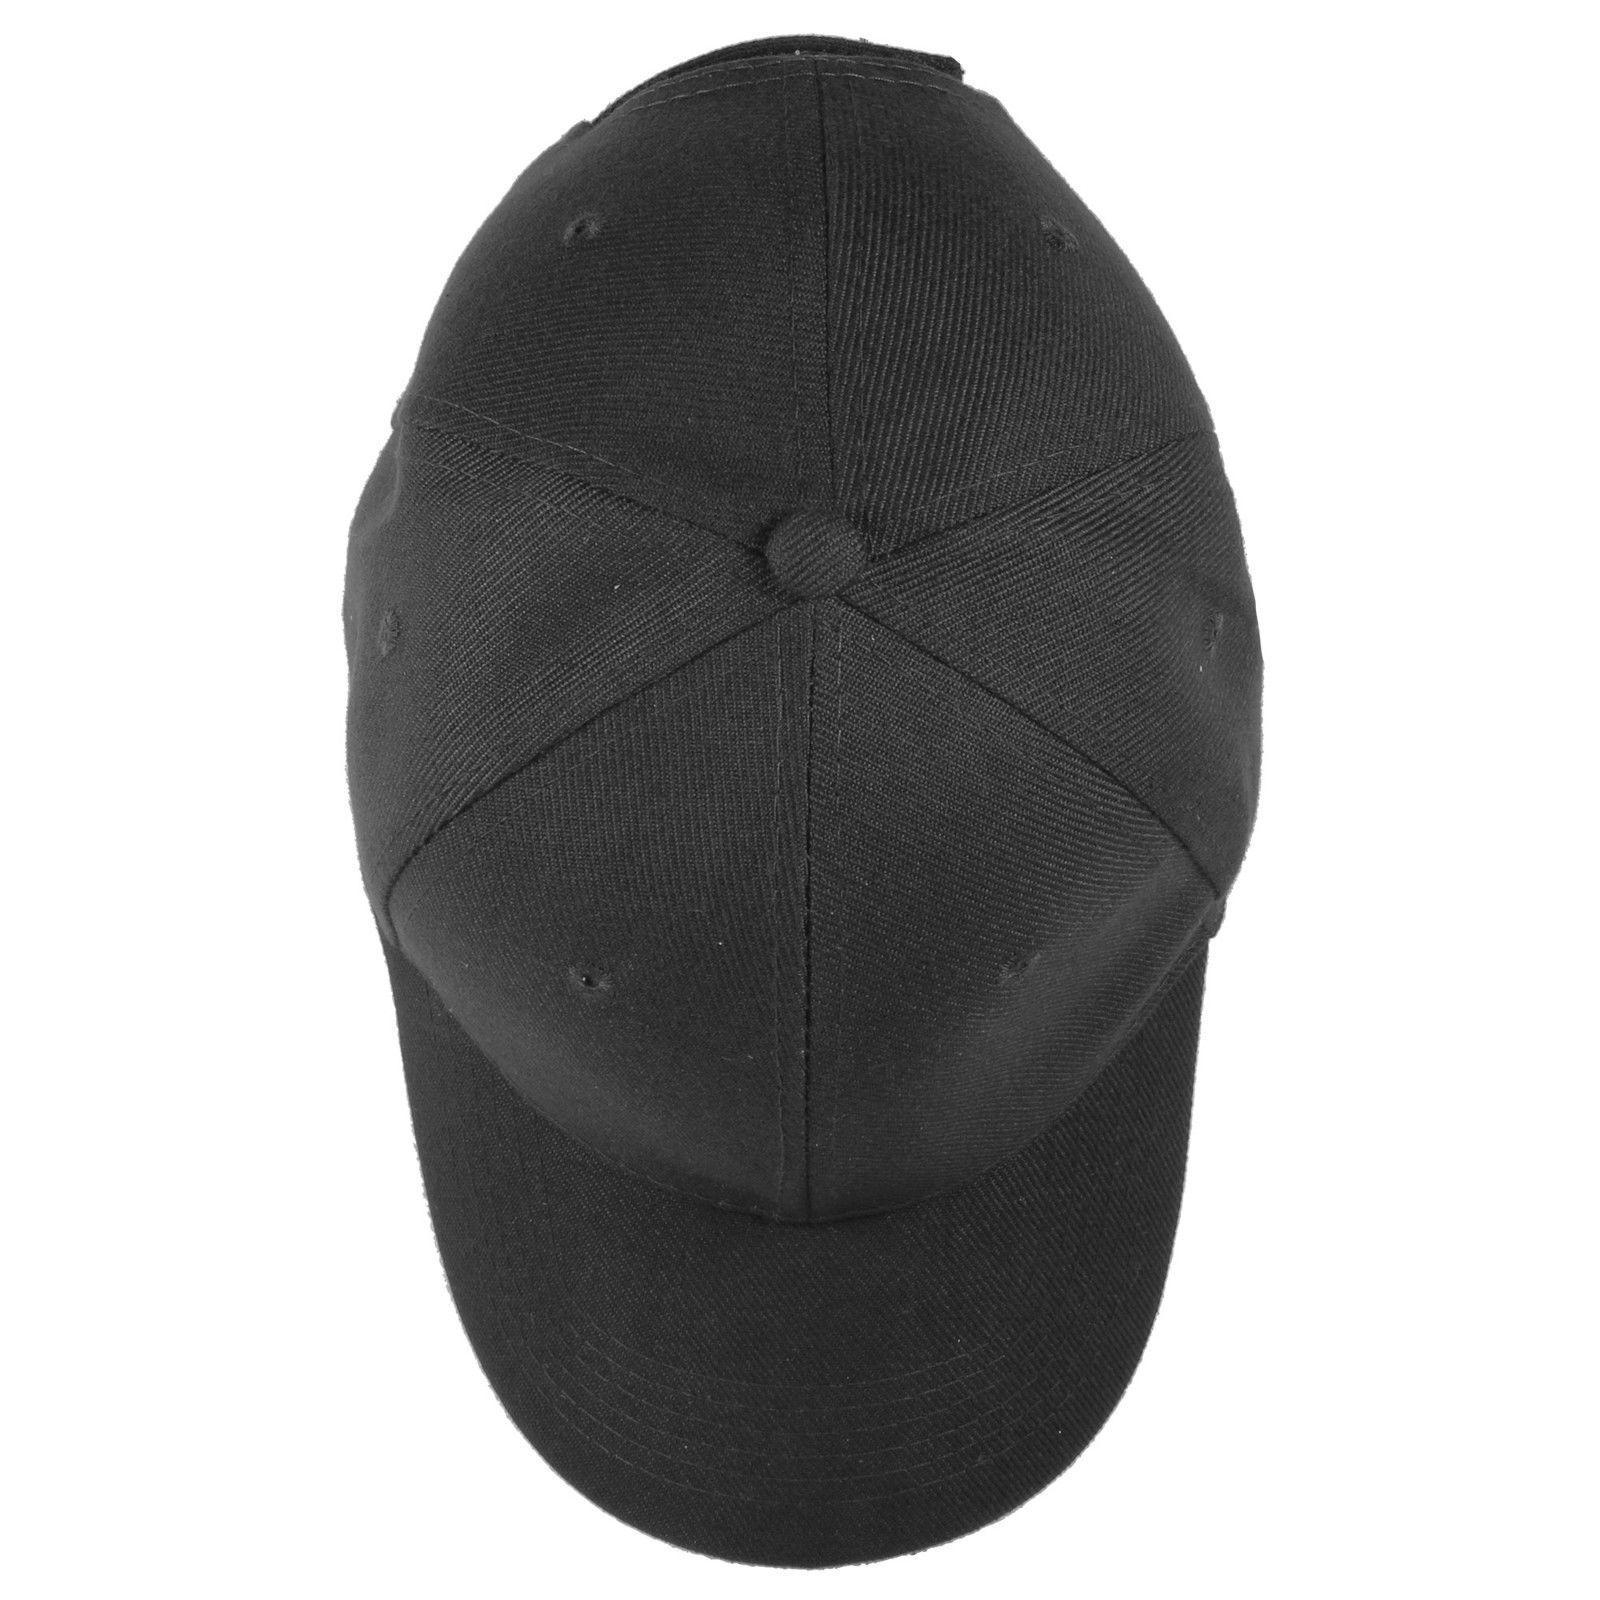 Plain Blank Solid Baseball Hats lot 12pcs